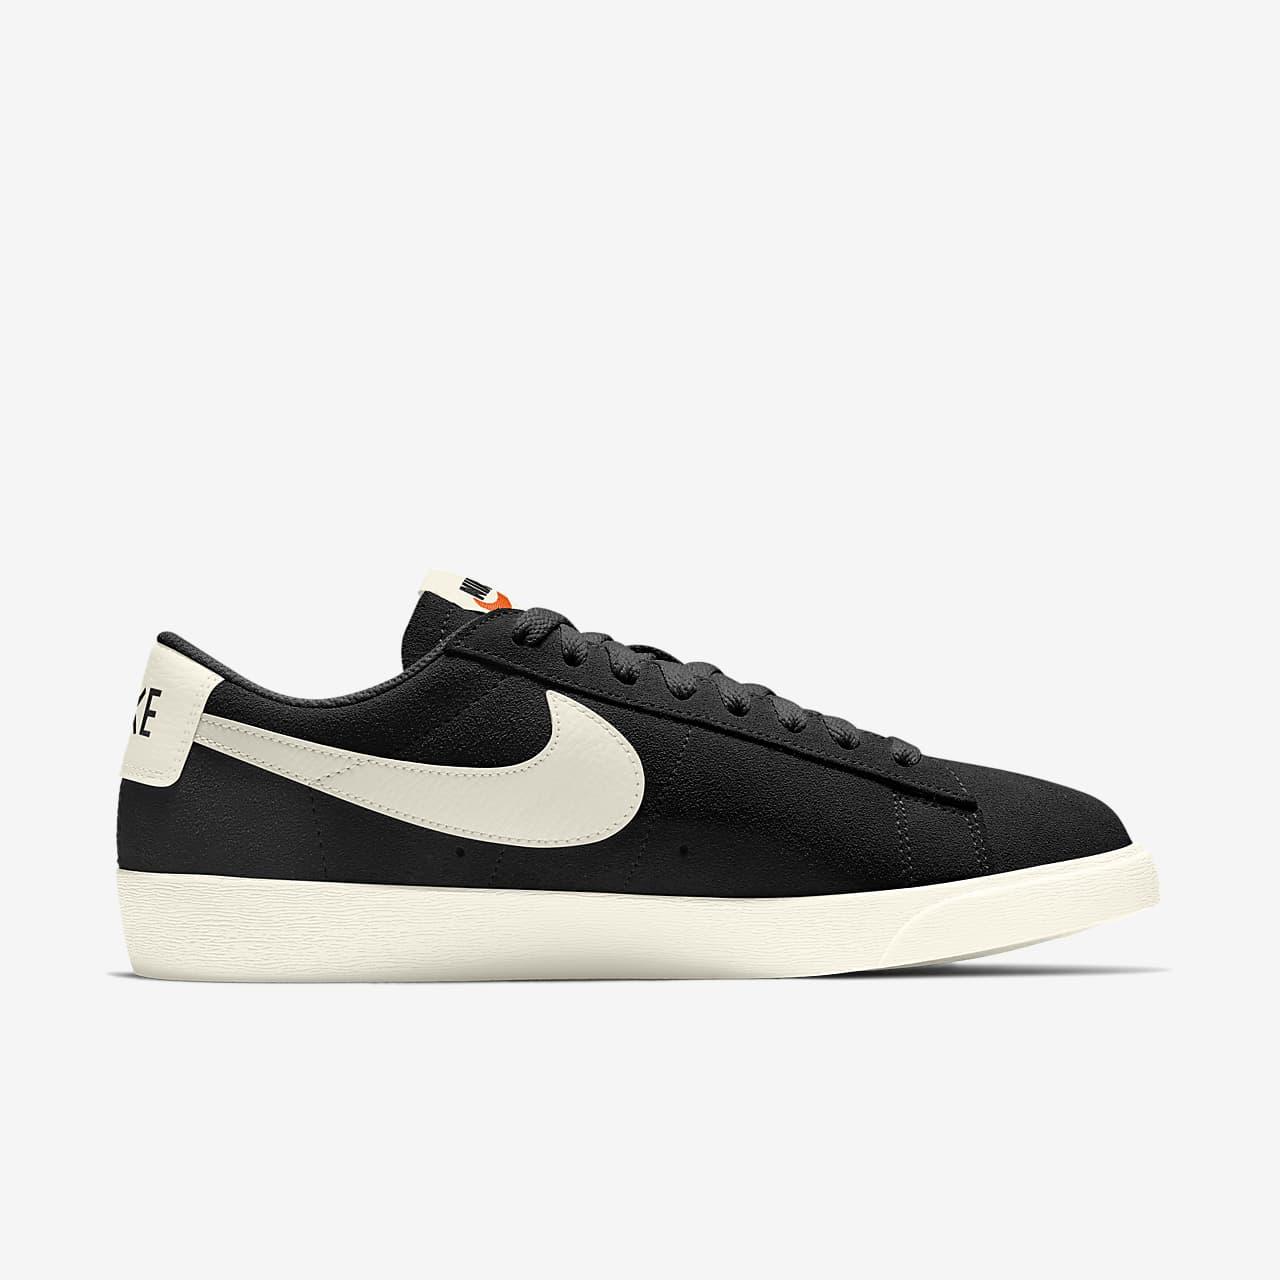 quality design 2fd17 f15cc Nike Blazer Low Suede